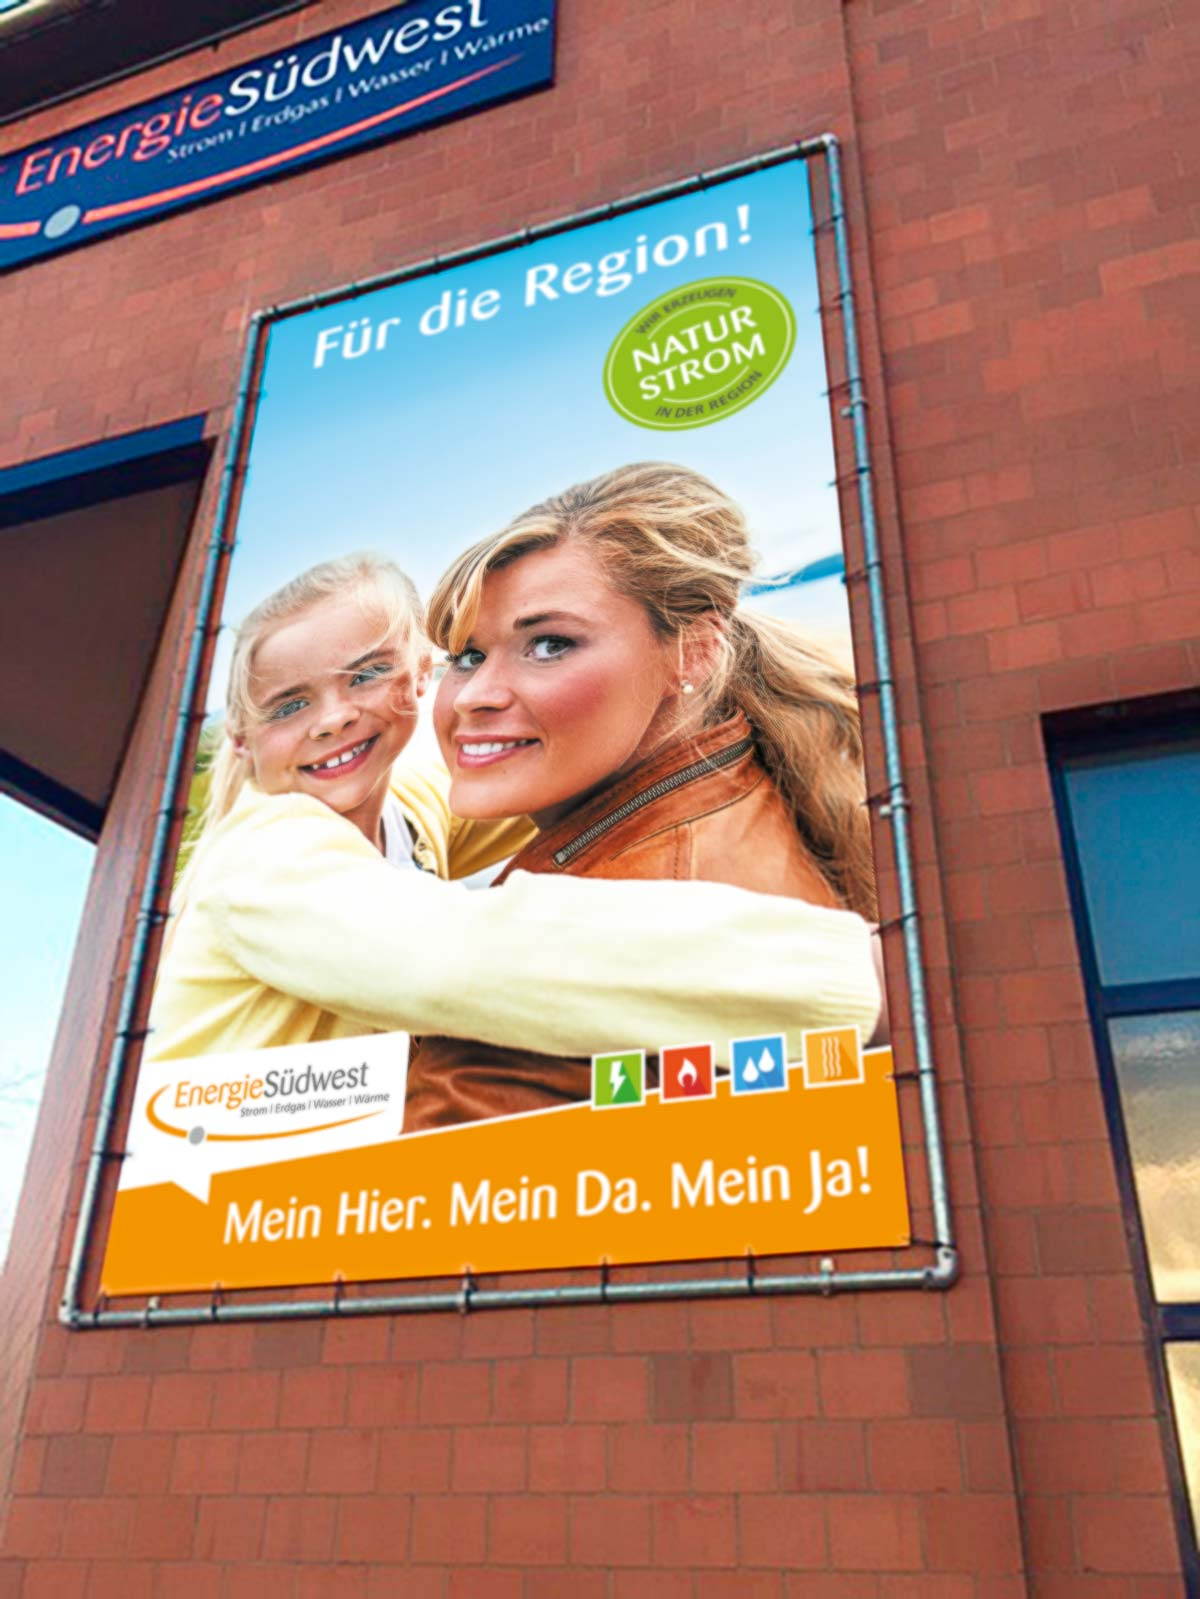 EnergieSüdwest AG, Strom,Werbemittel, Fassadenbanner